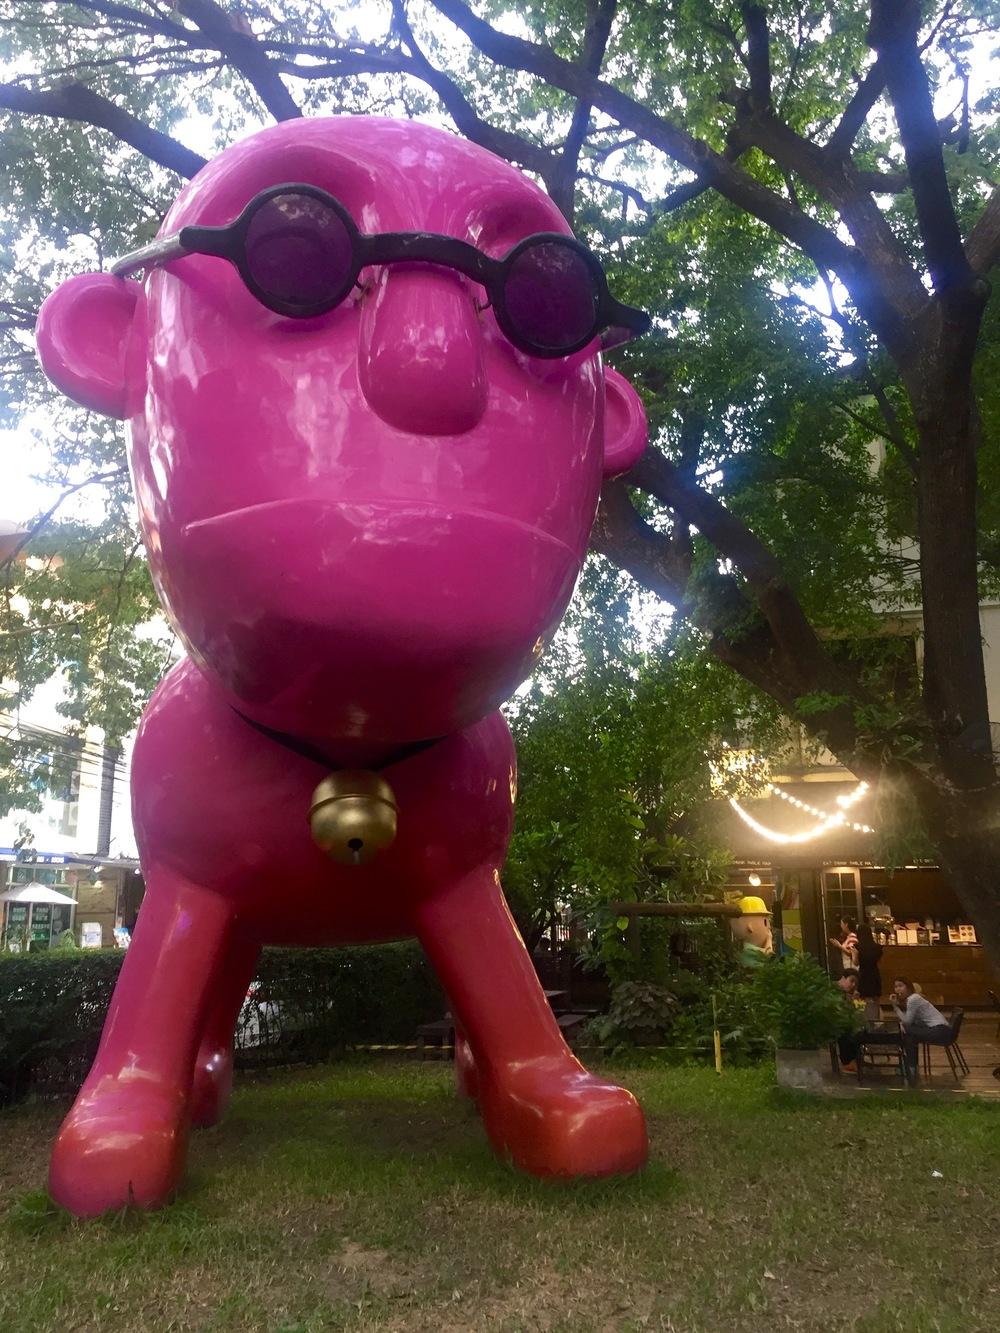 Fun dog sculpture at iBerry Garden in Chiang Mai